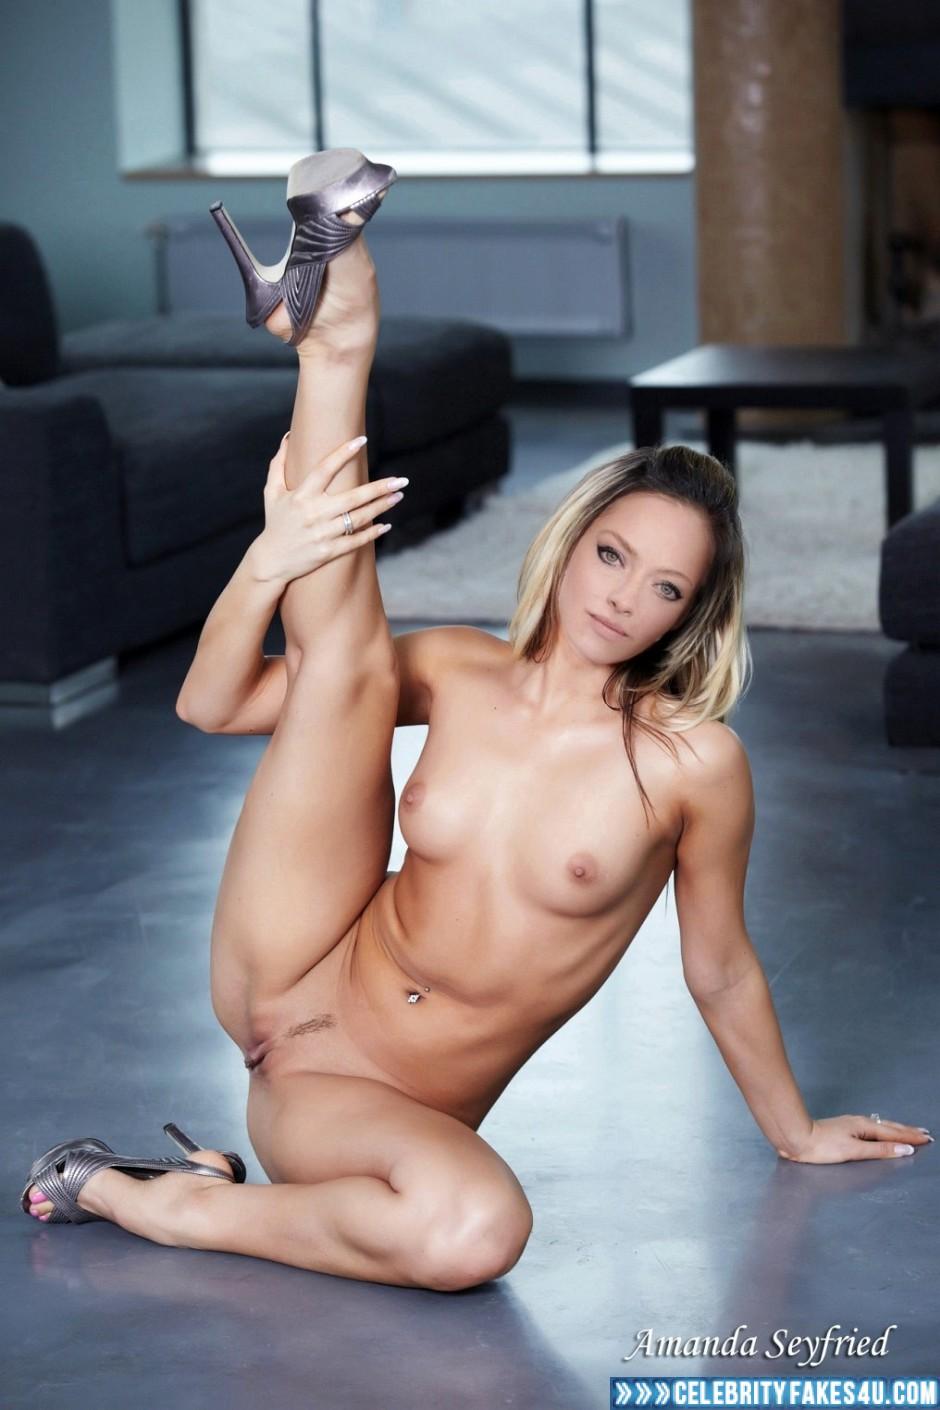 Amanda Seyfried Tits amanda seyfried naked body vagina legs spread fake 002